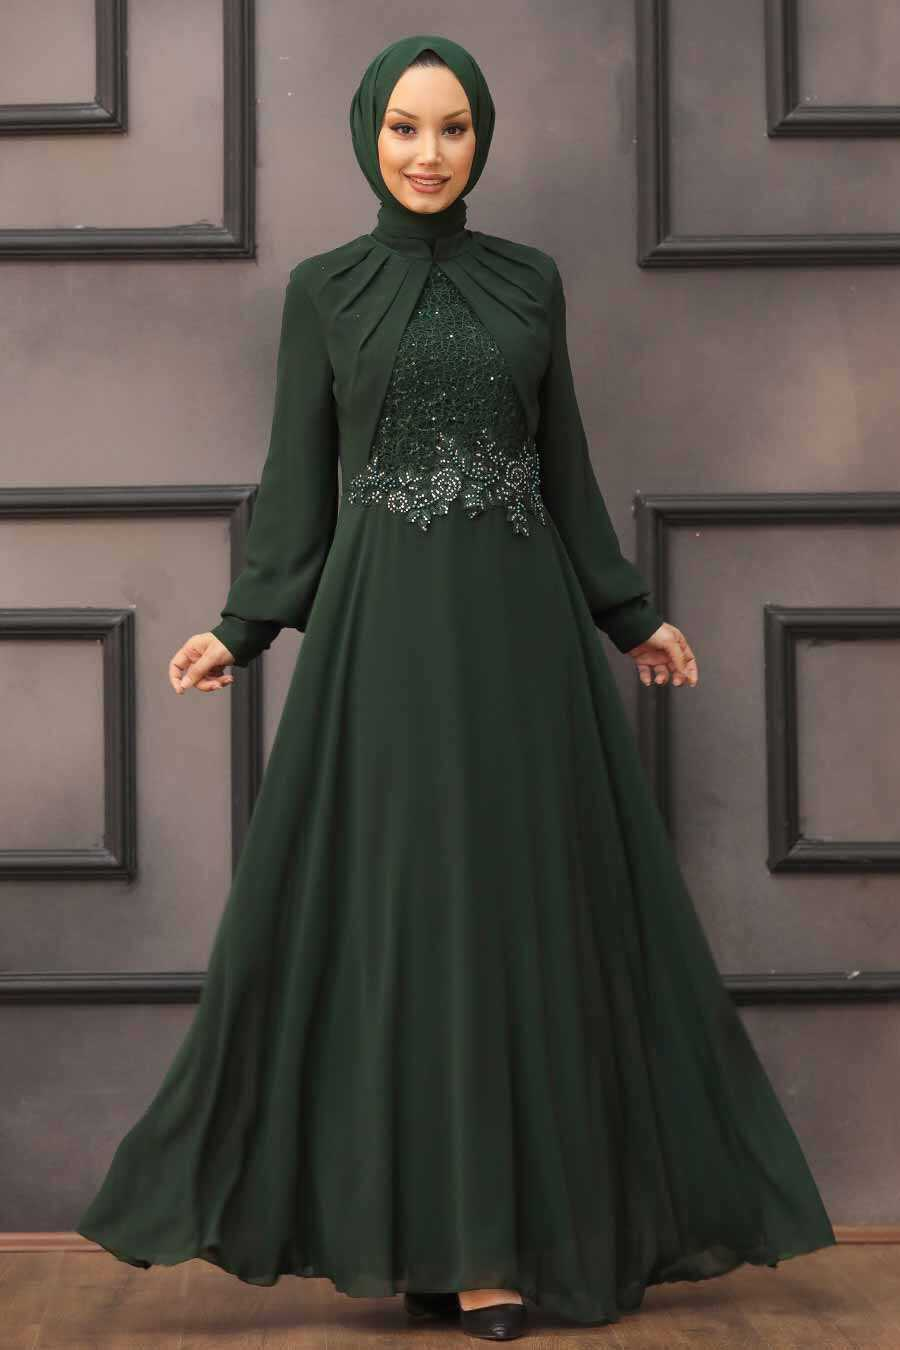 Green Hijab Evening Dress 52785Y